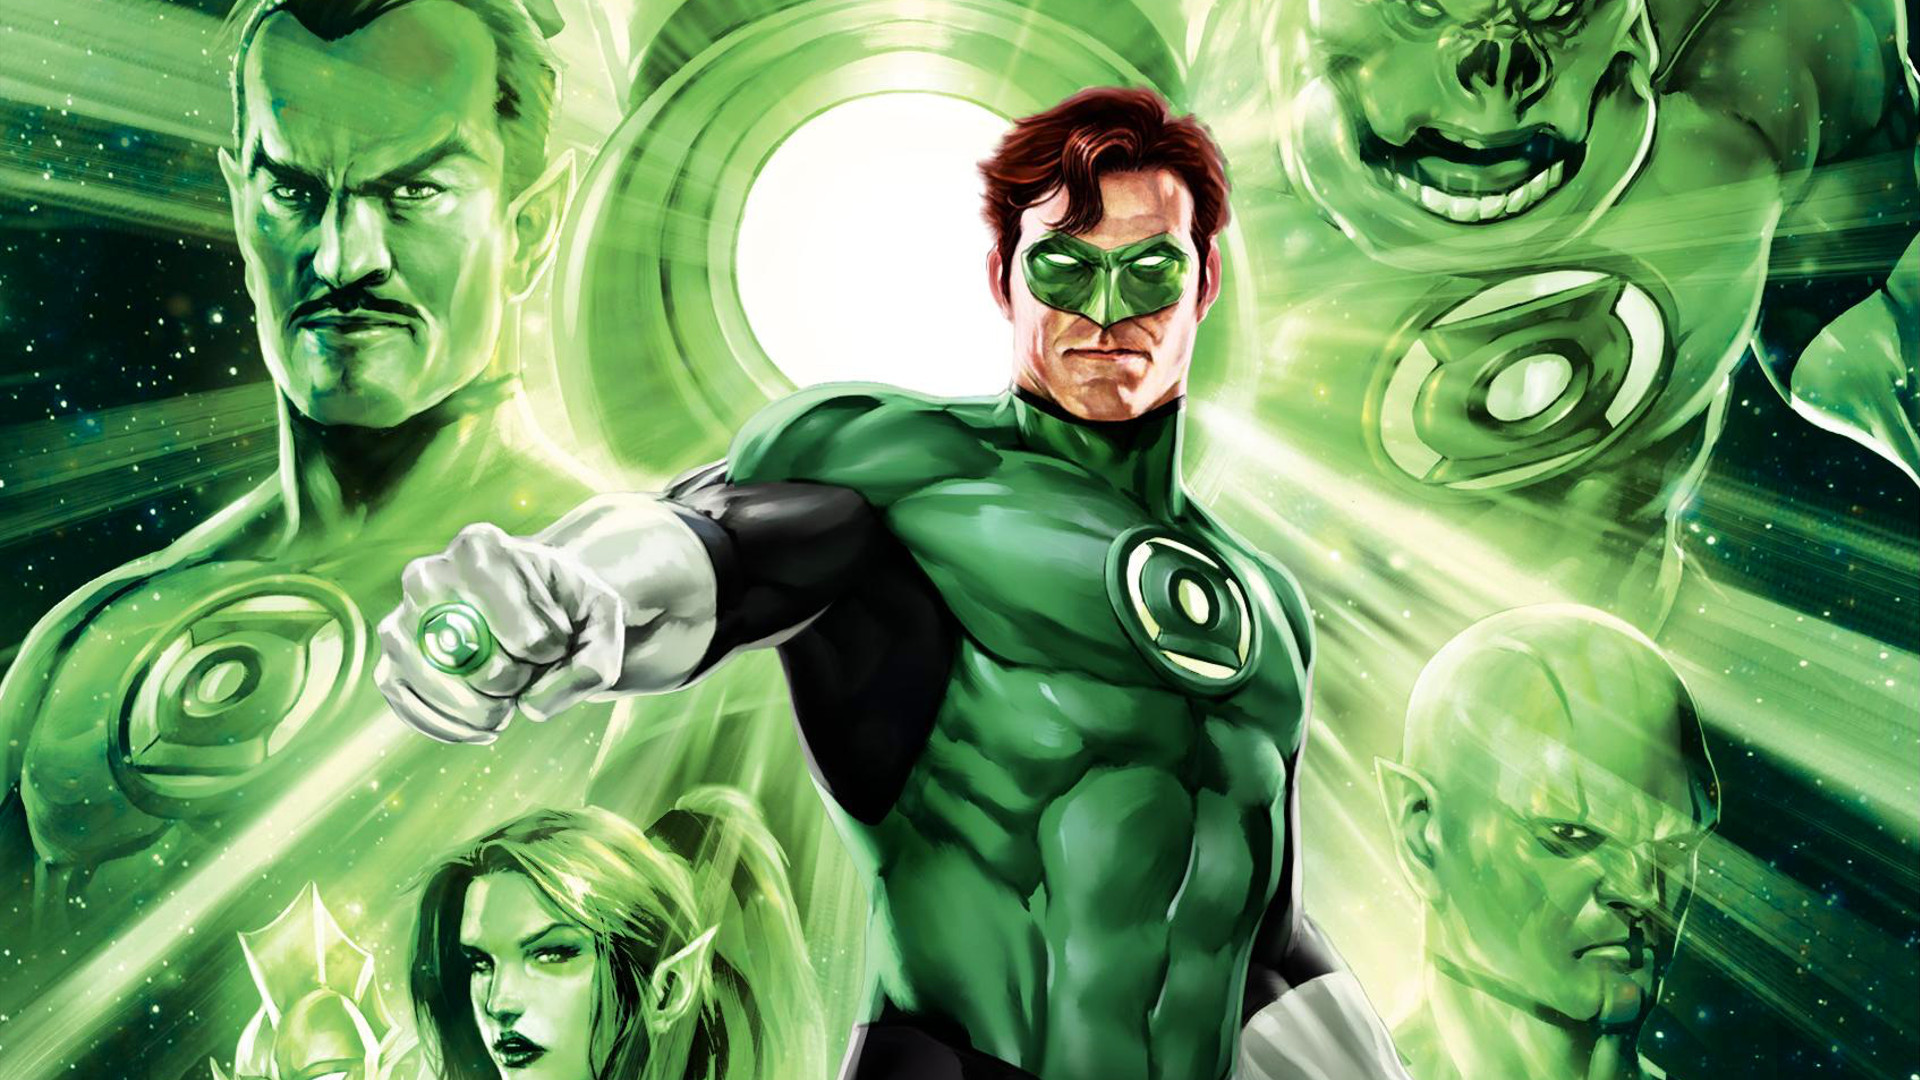 1920x1200 Green Lantern Dc Comics Deadpool Wade Wilson Marvel 1440x900 Wallpaper